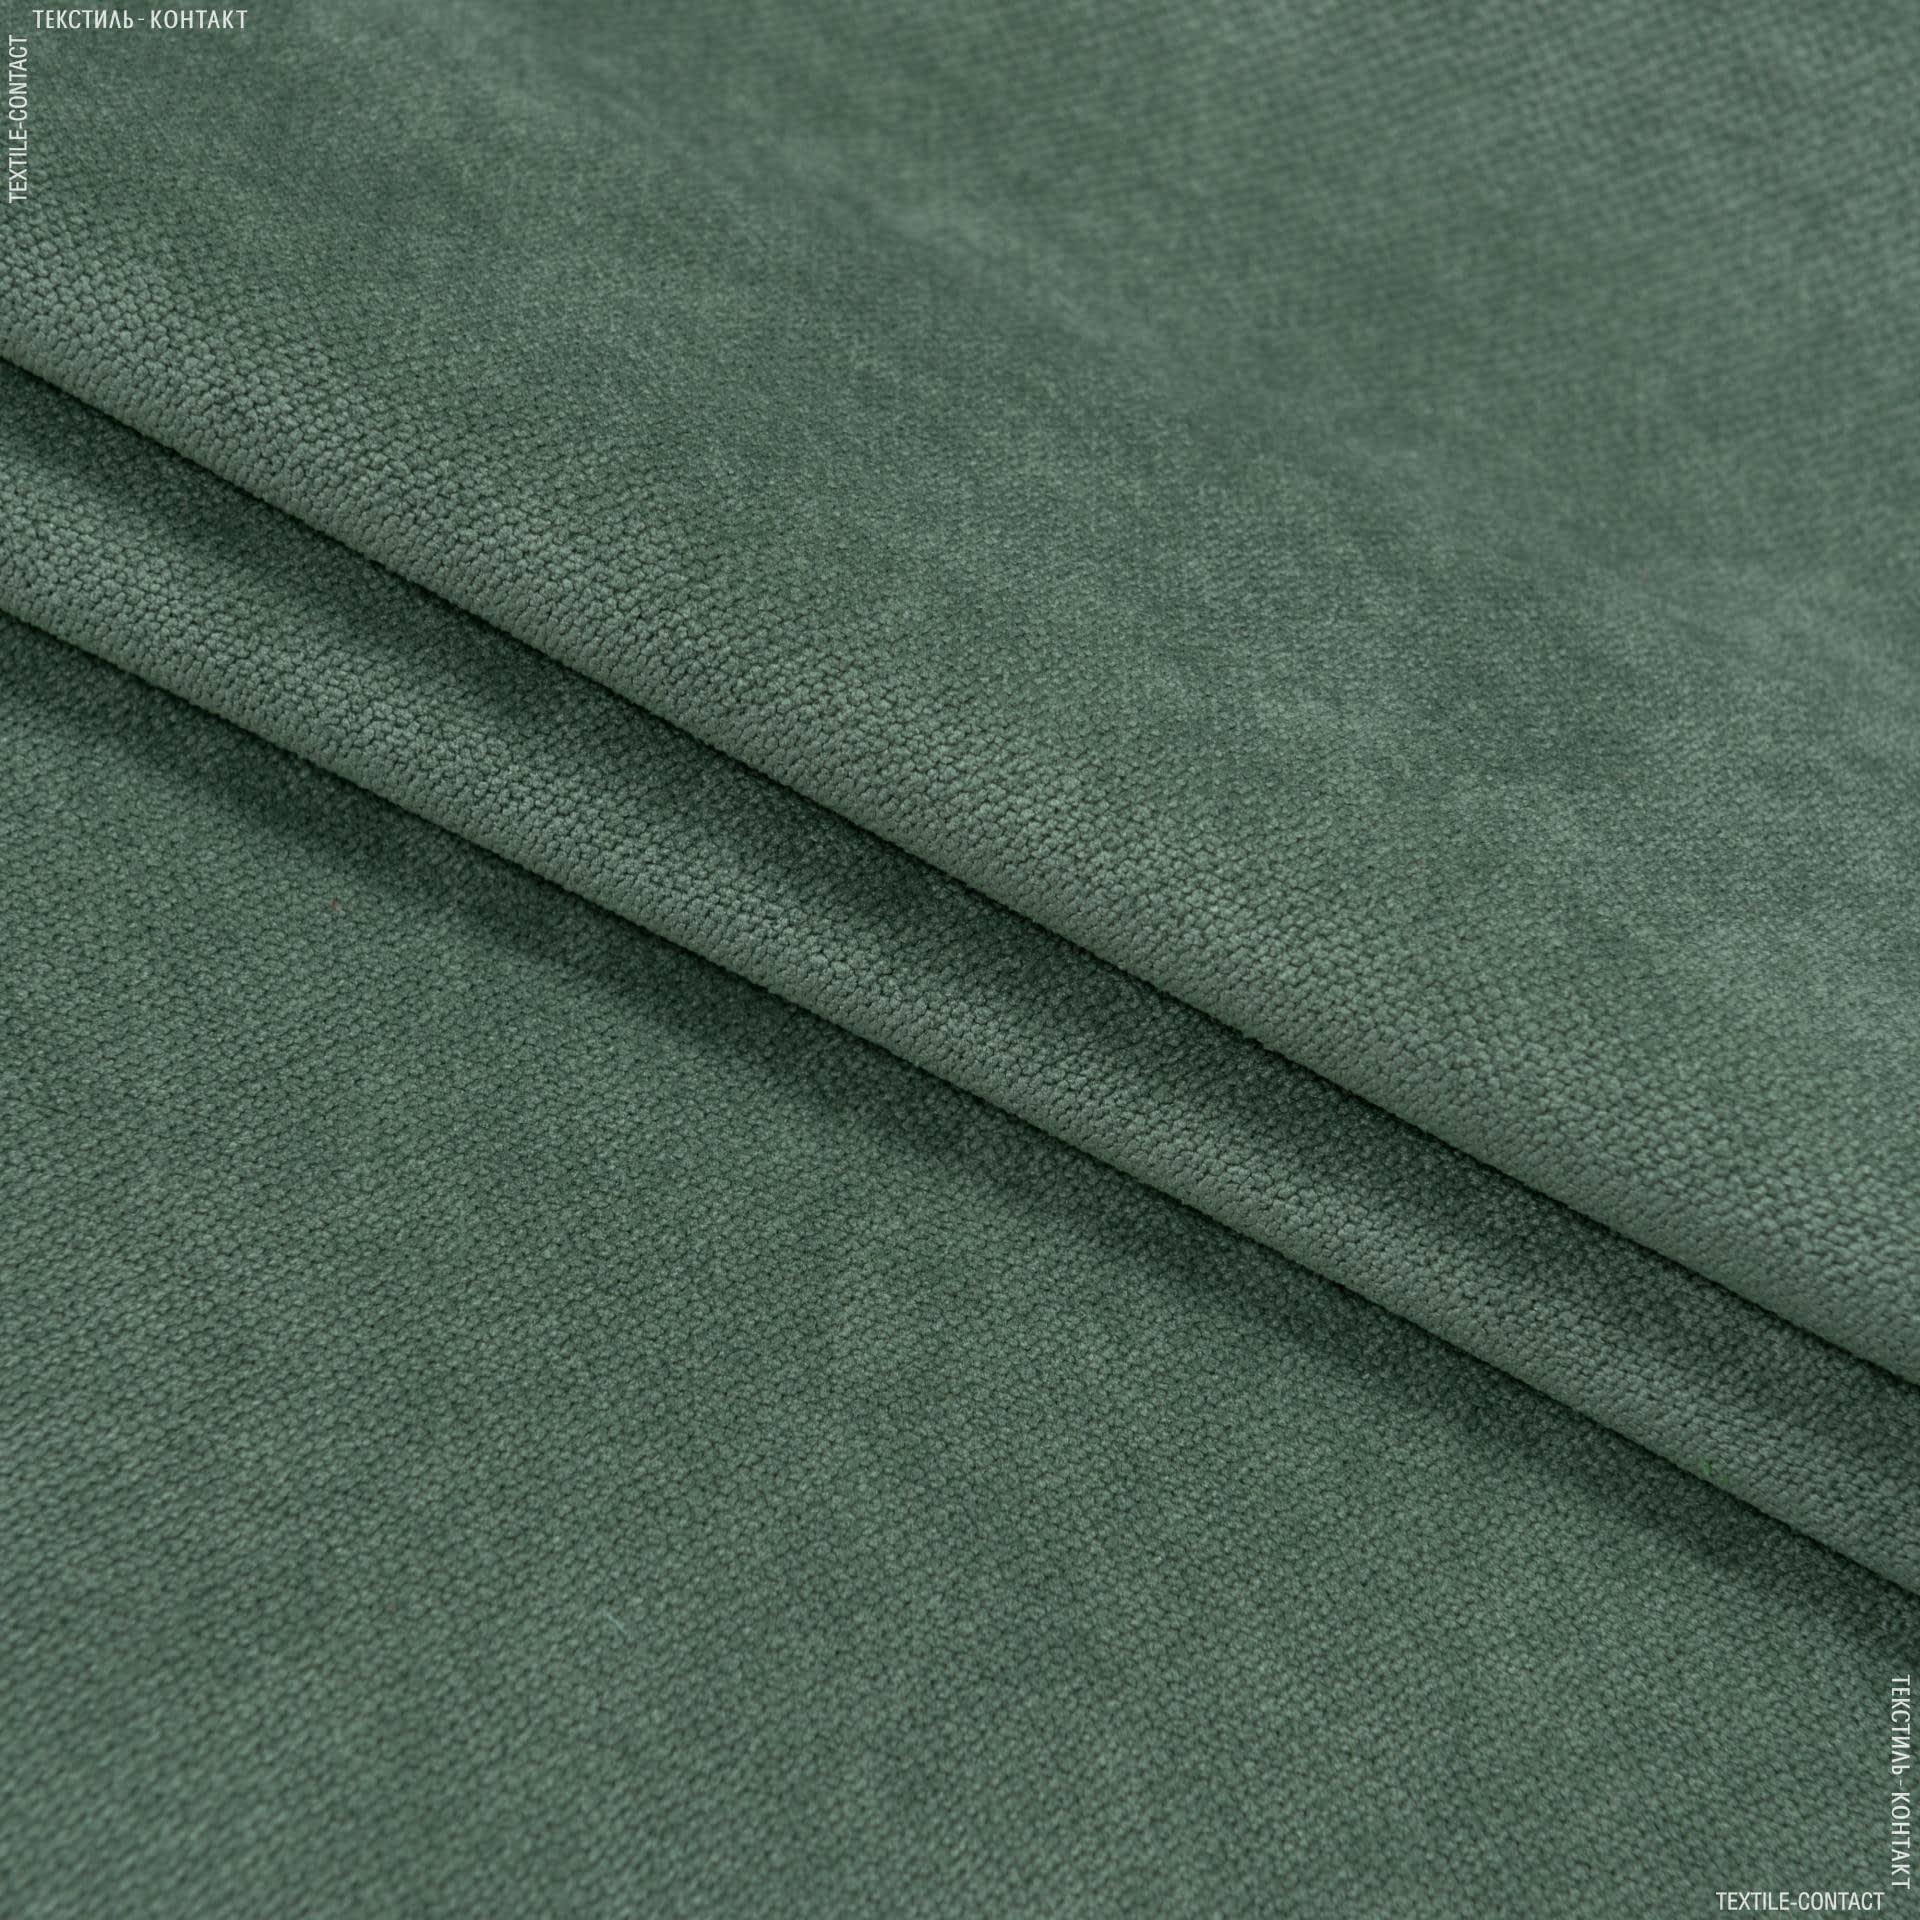 Ткани для мебели - Велюр будапешт/budapest морская зелень